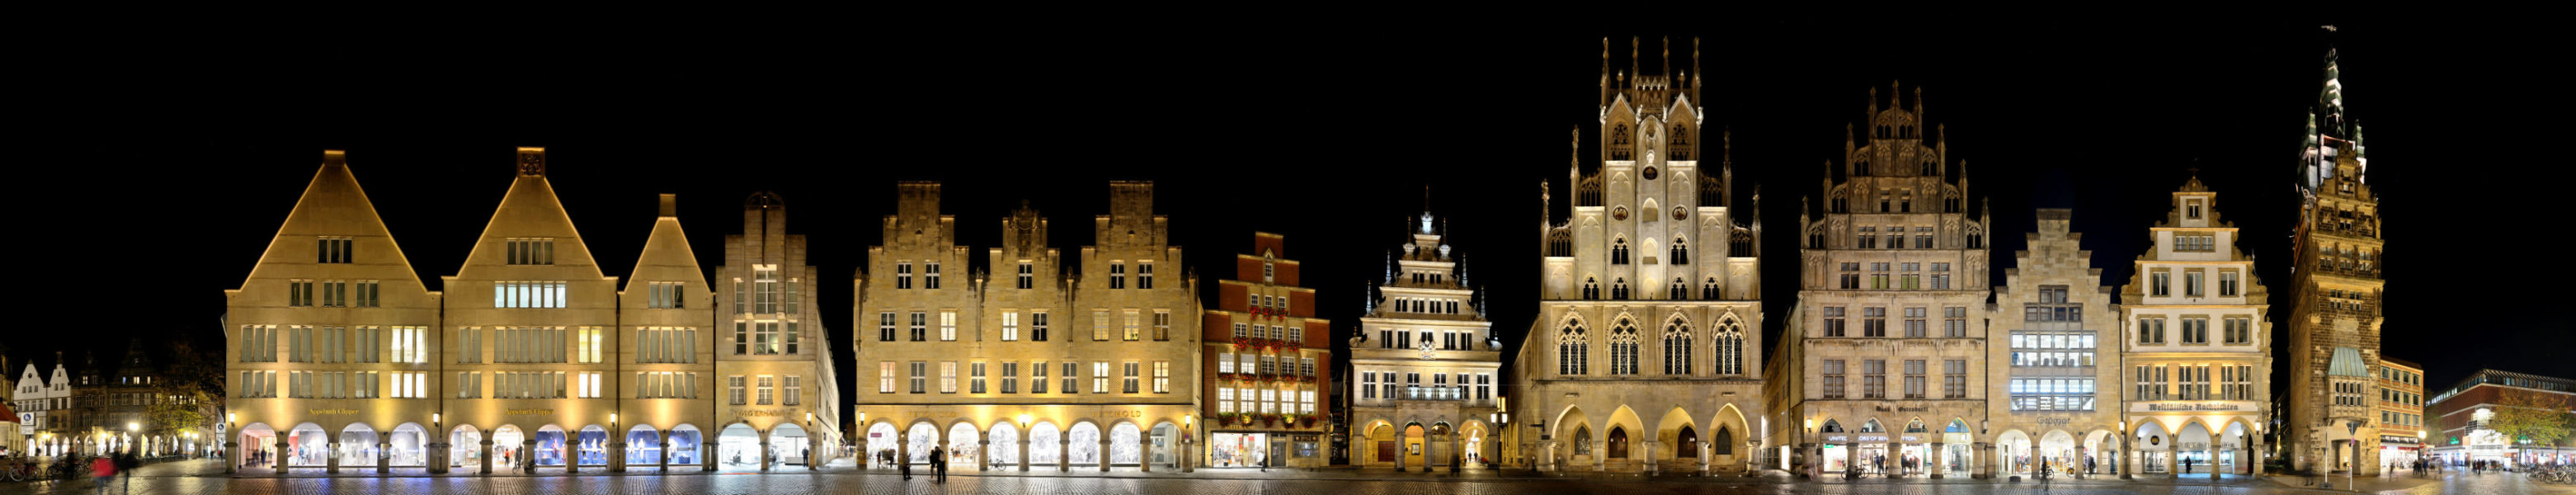 Prinzipalmarkt | Historical City Hall